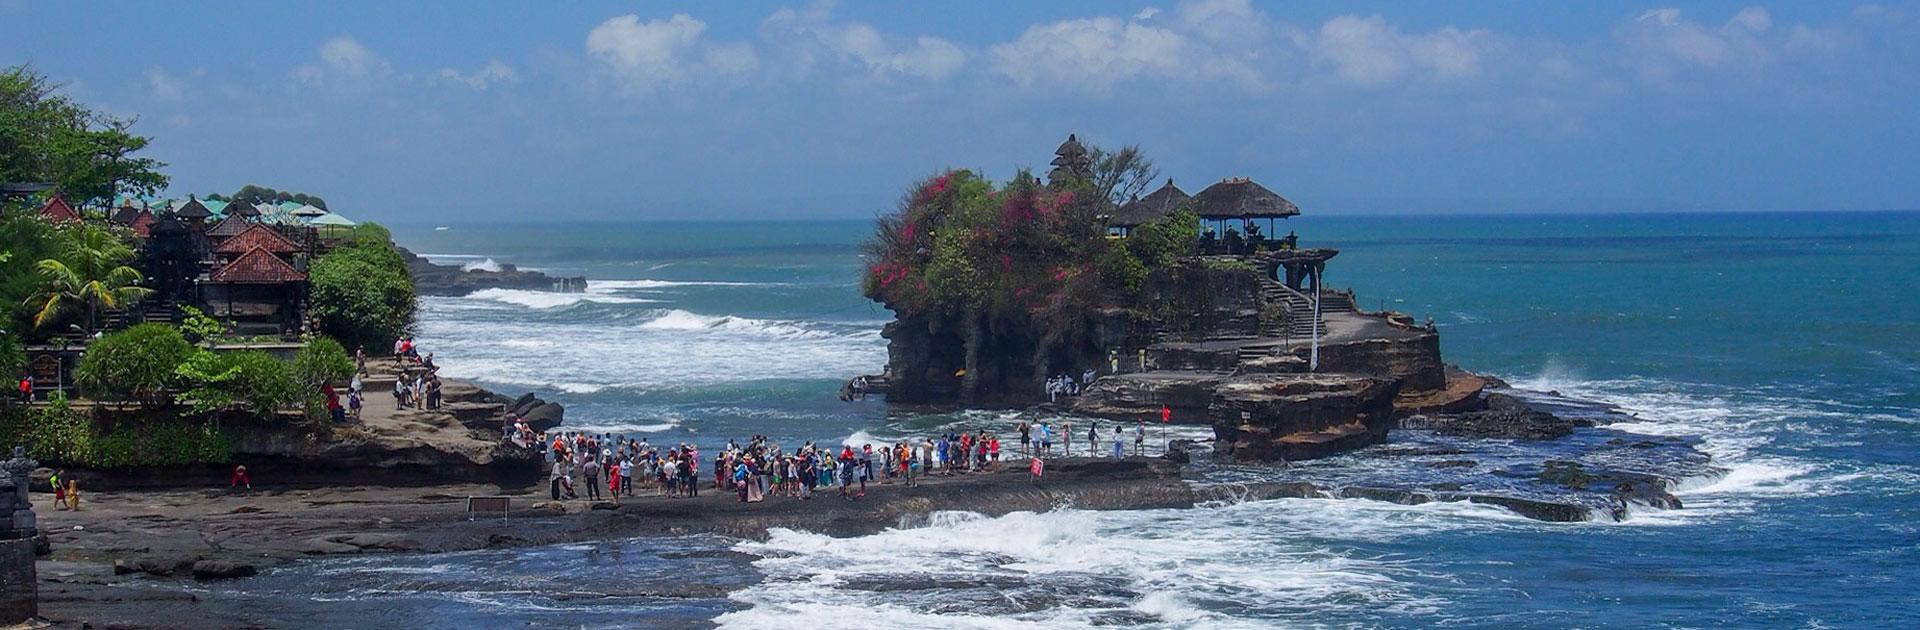 ID Bali Natural 10 días 2